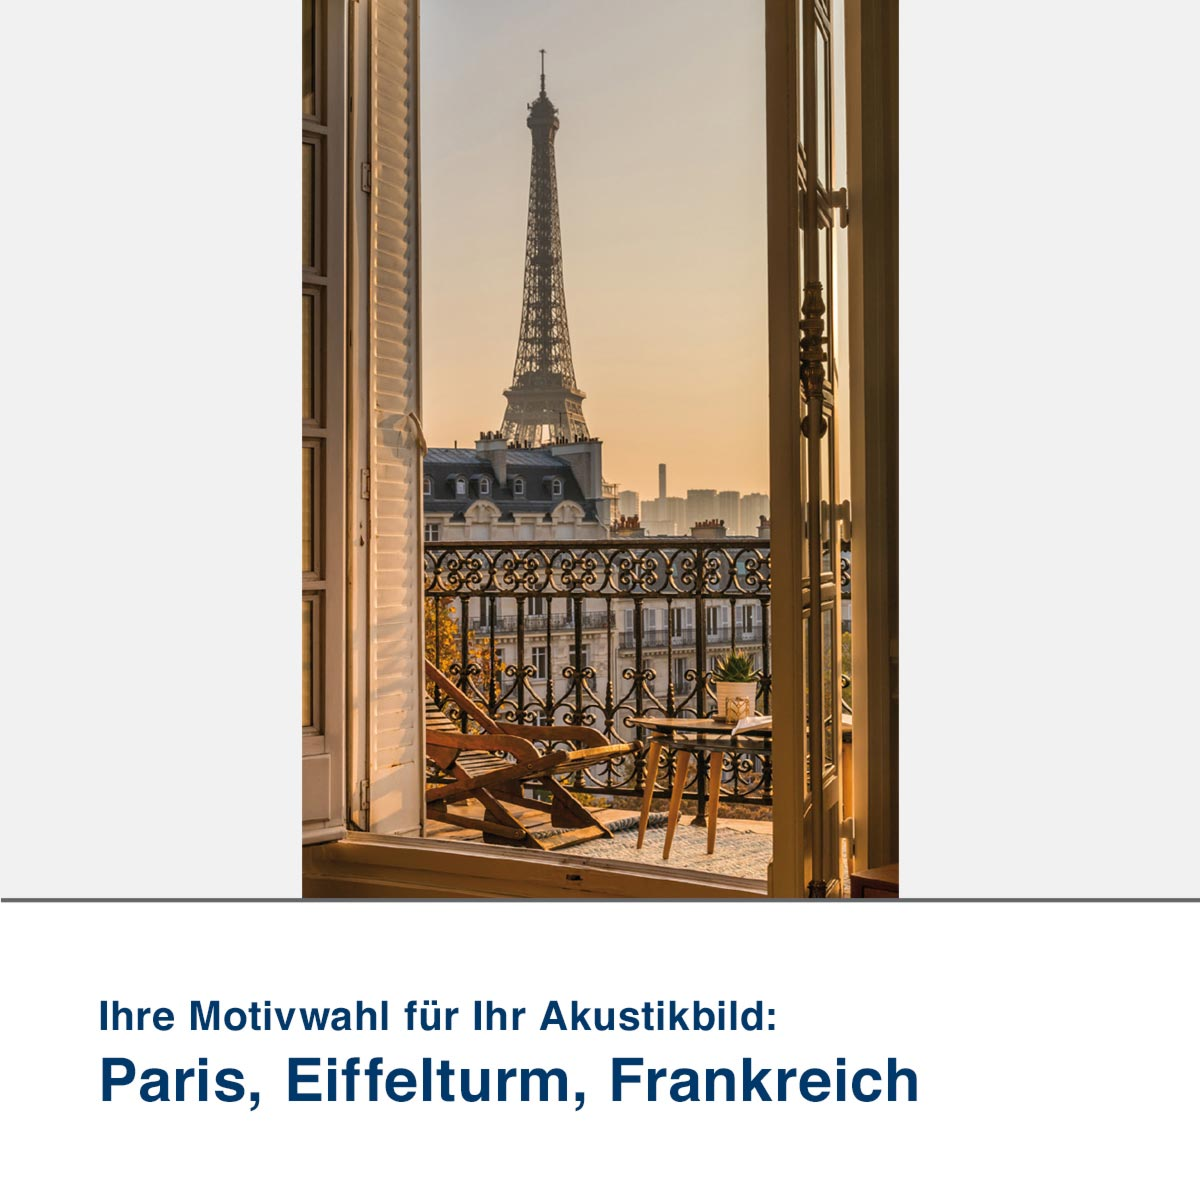 Akustikbild Motiv Paris, Eiffelturm, Frankreich